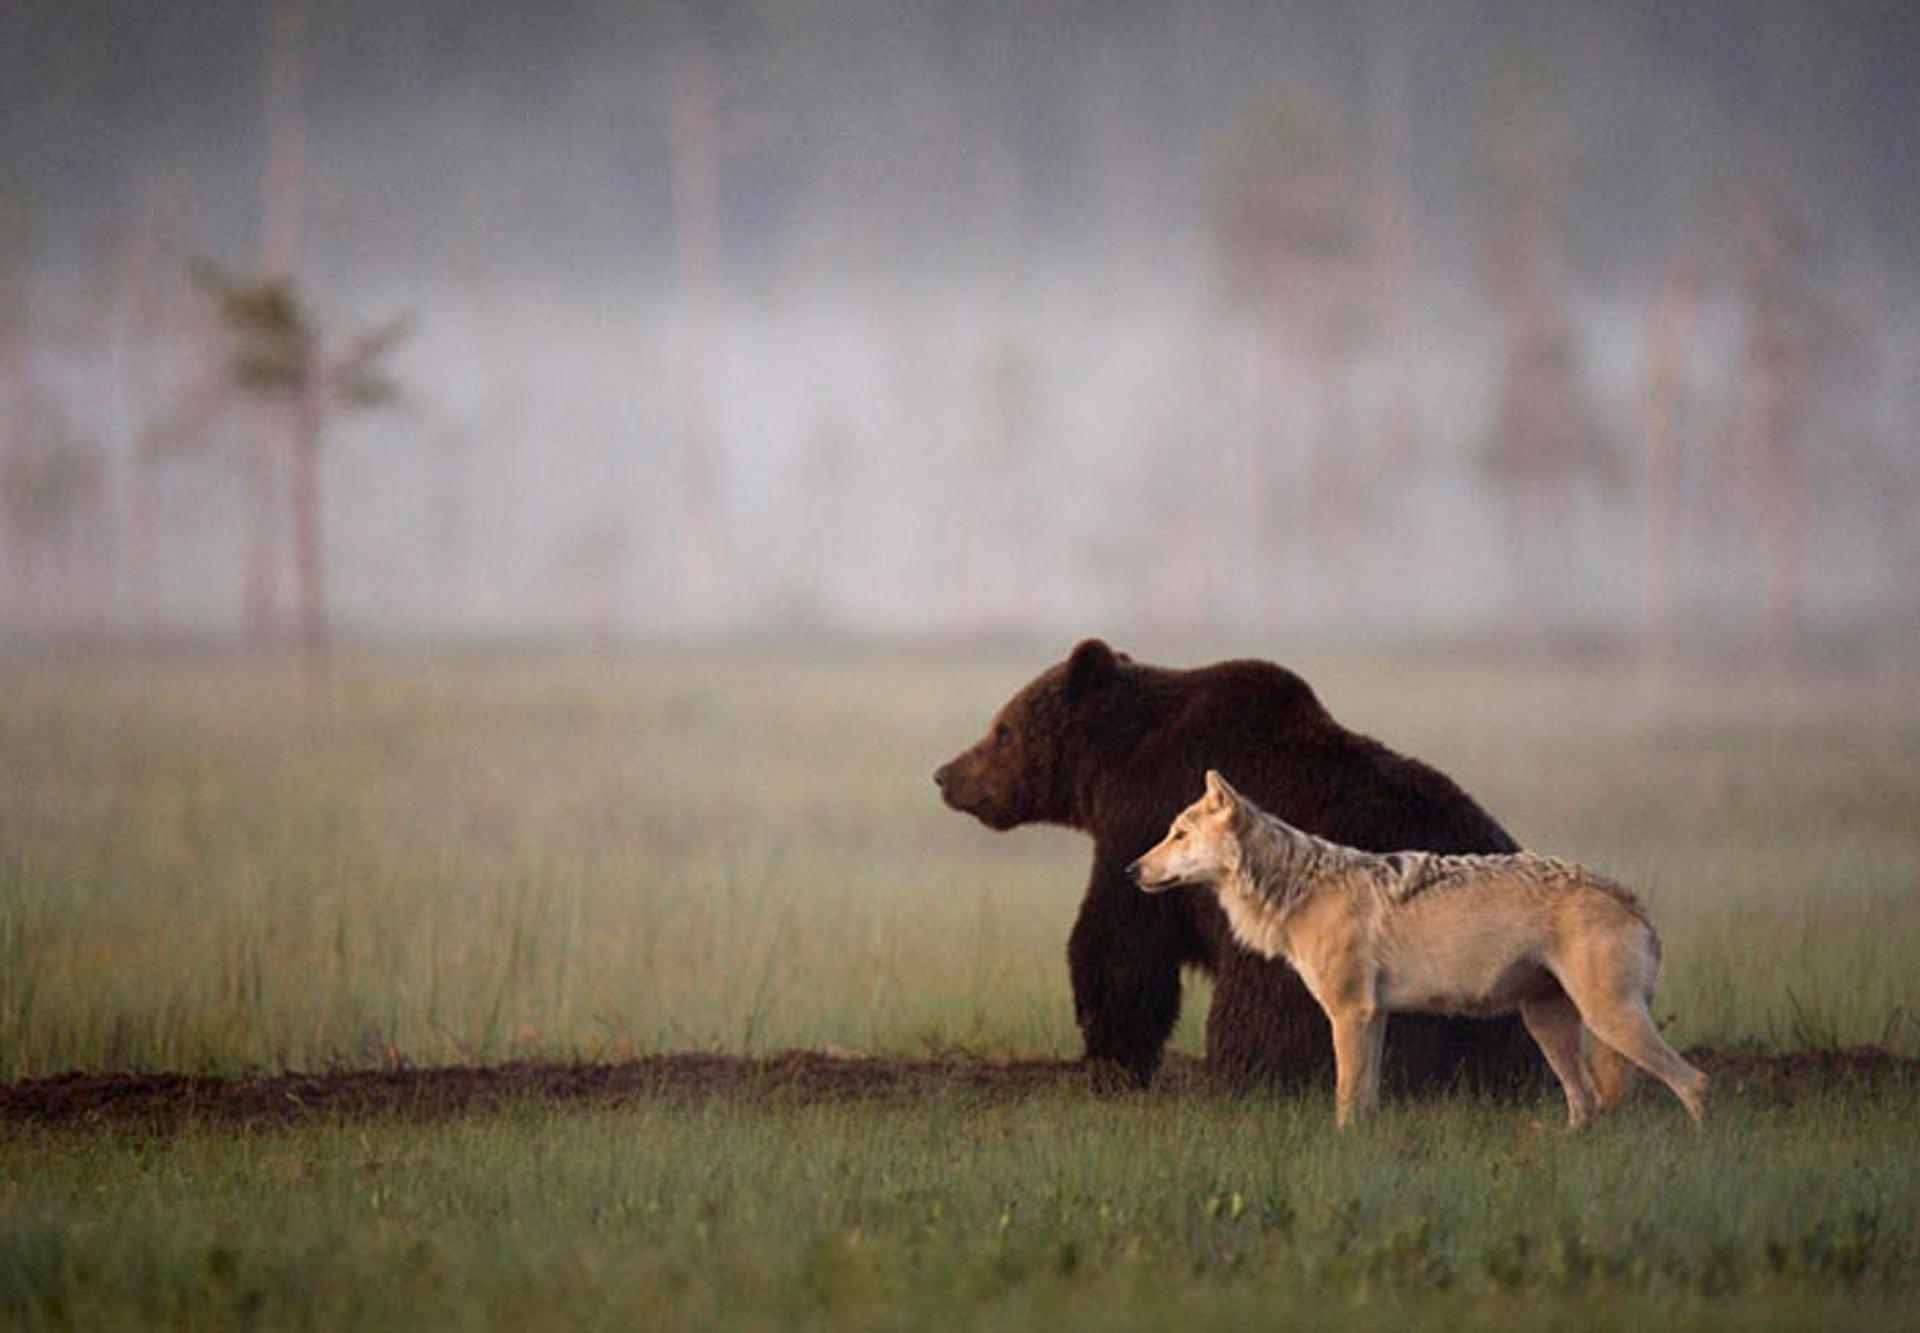 rare-animal-friendship-gray-wolf-brown-bear-lassi-rautiainen-finland-cover